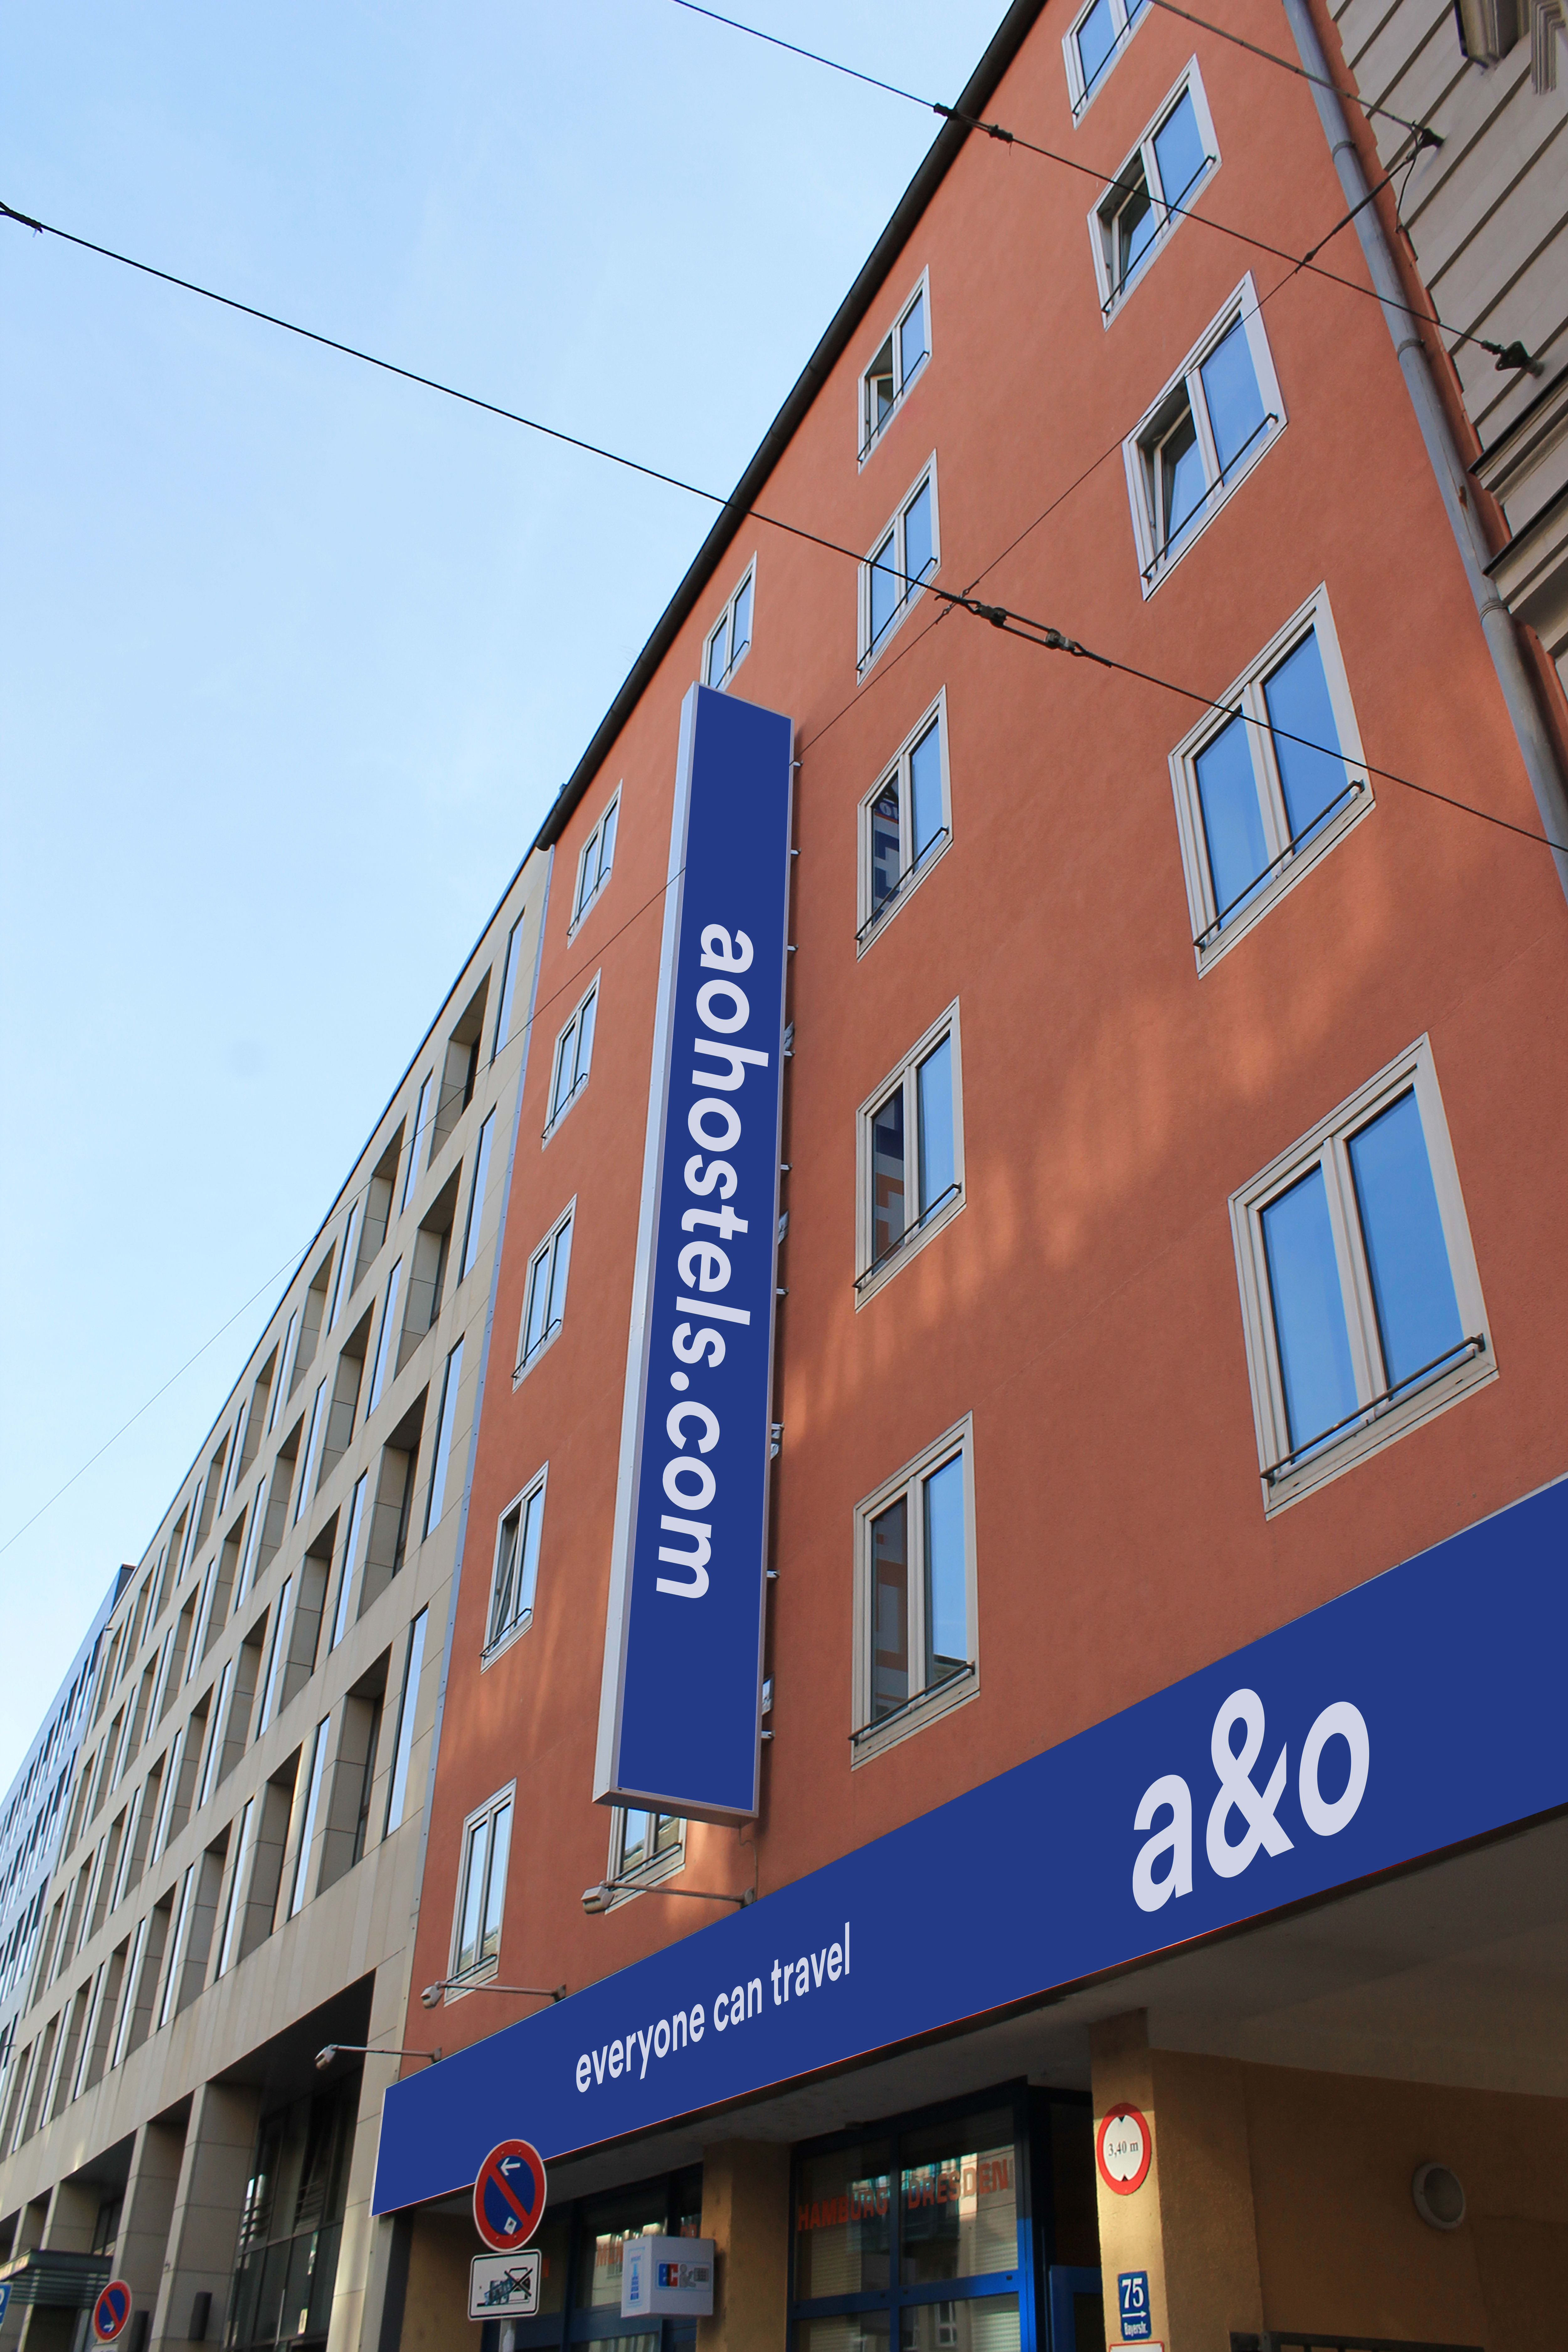 A&O City Hauptbahnhof Muenchen